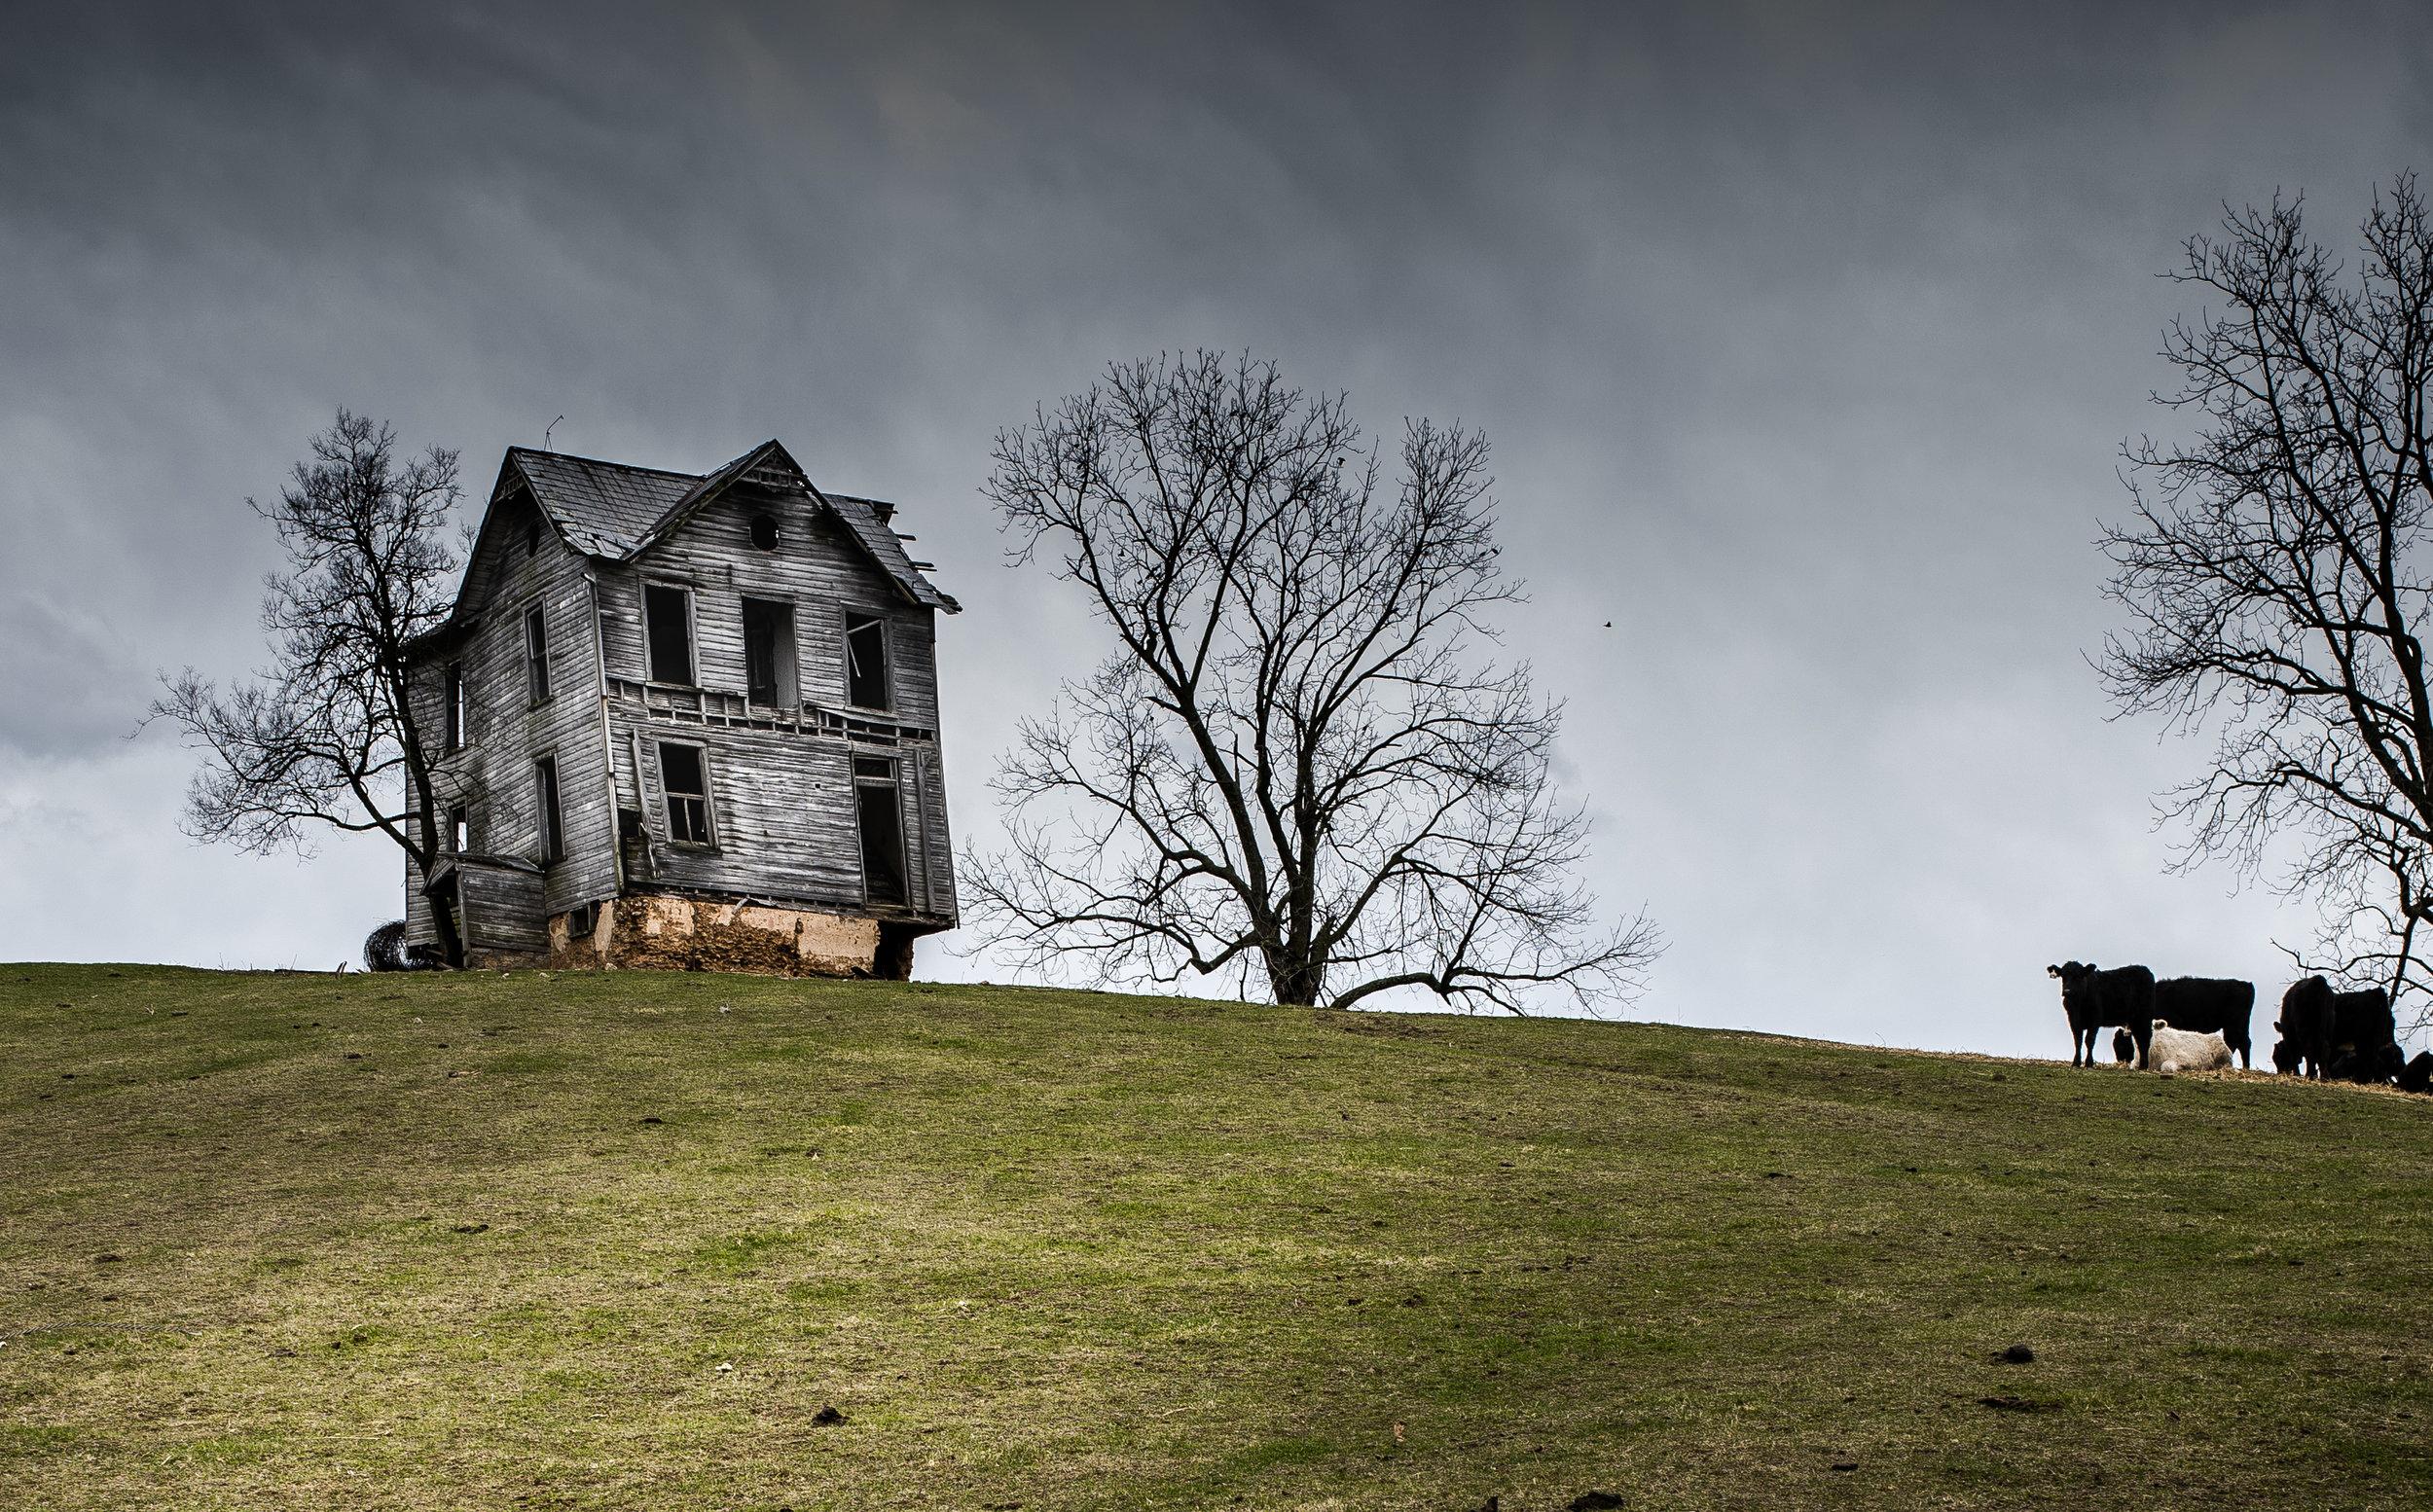 an old 1880's Virginia farmhouse clings to life…..